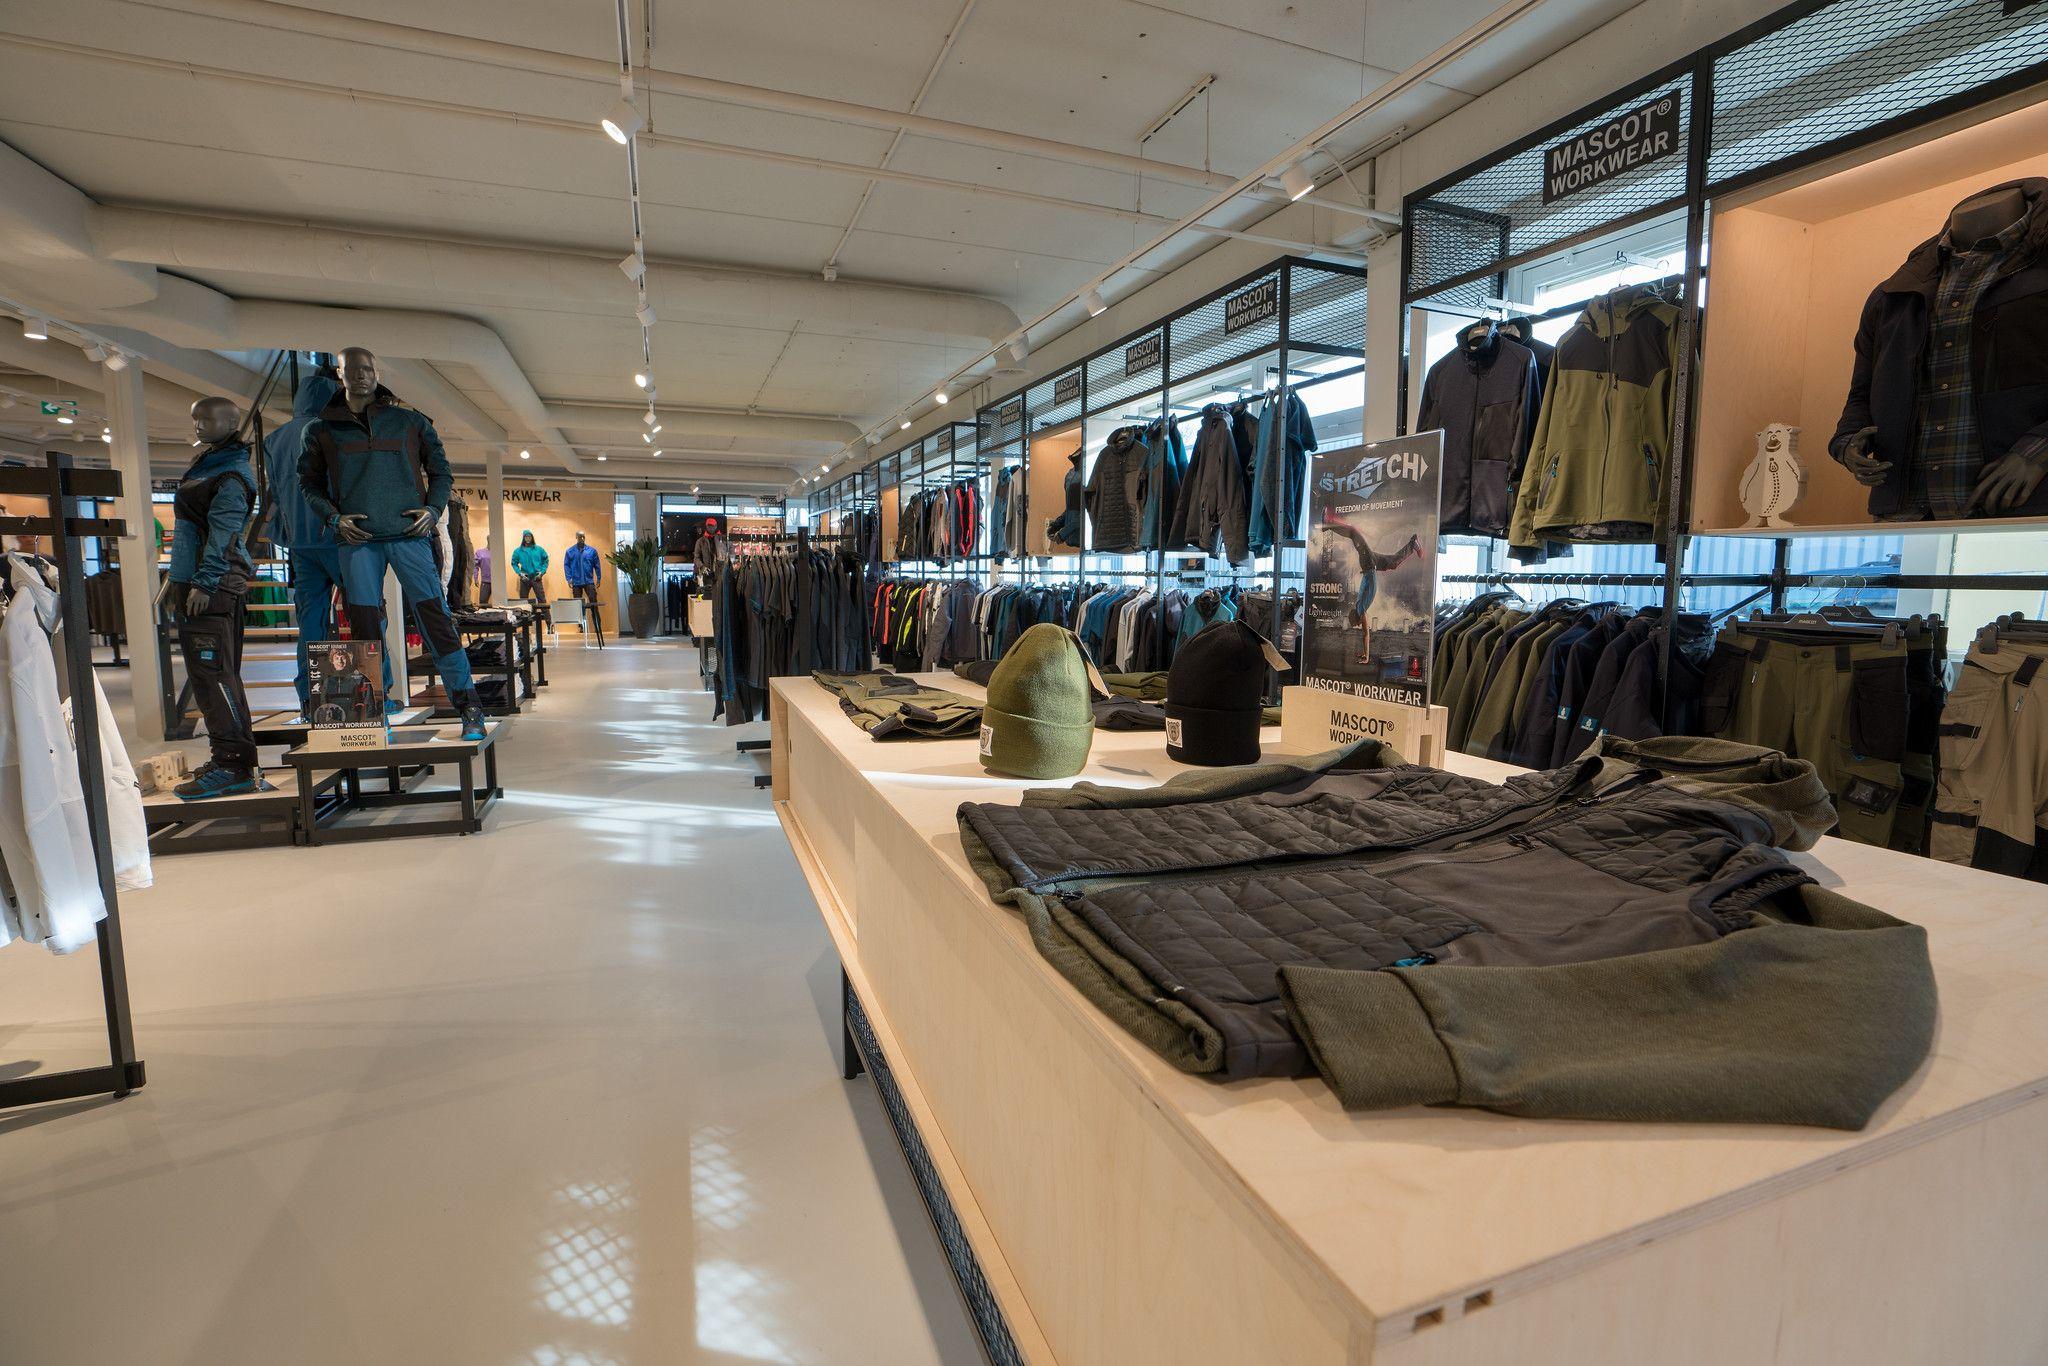 5abe4ba5b56 Mascot Workwear Shop Concept. #Norbec_Design | MASCOT WORKWEAR